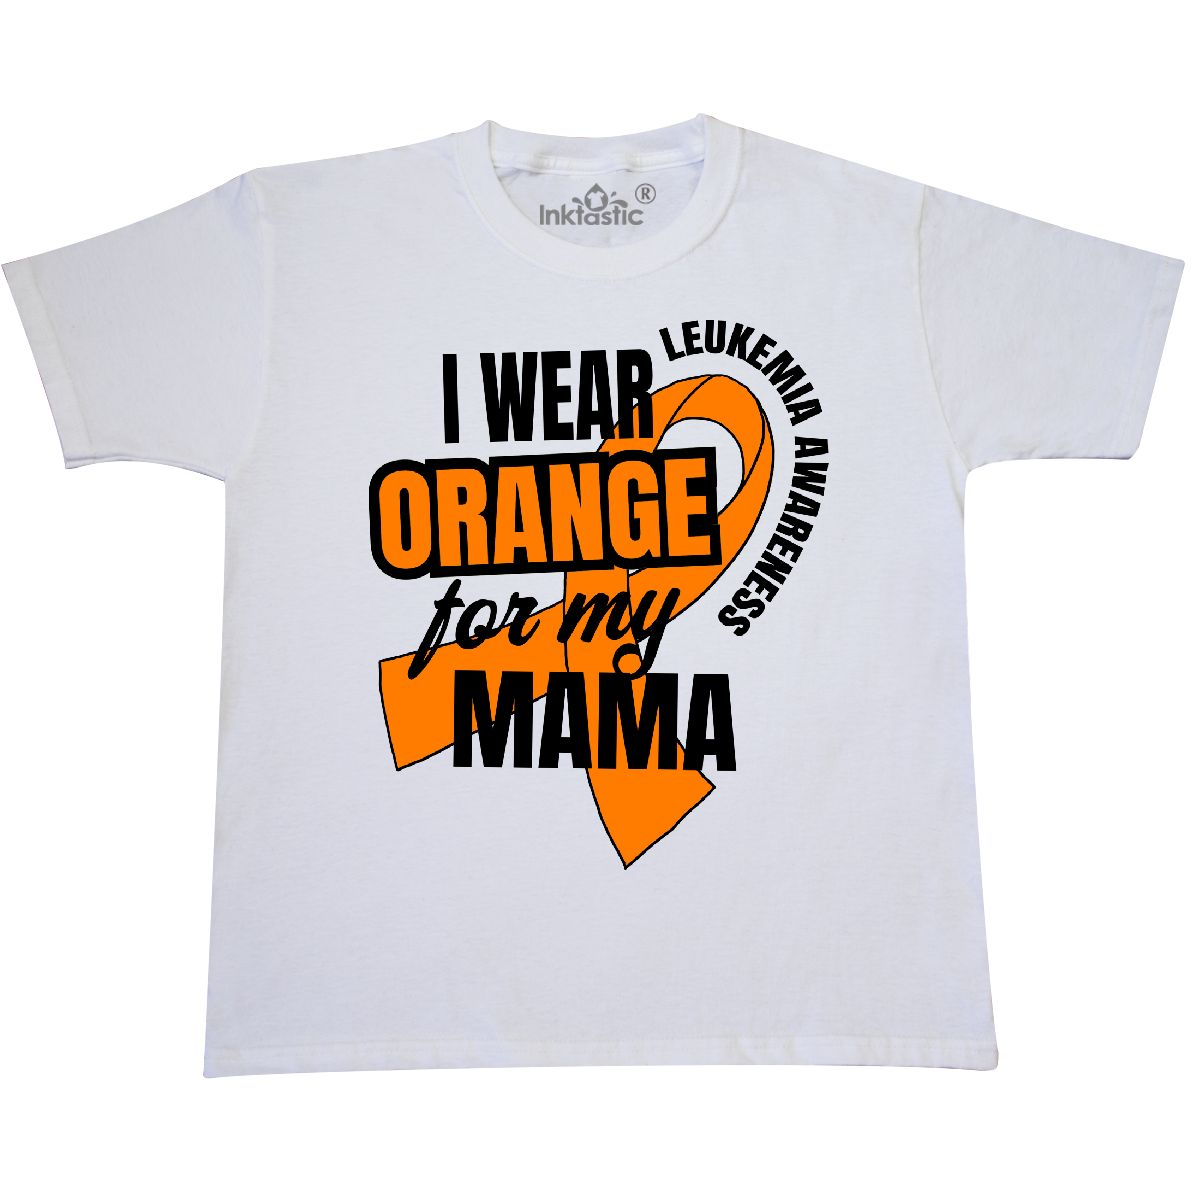 inktastic I Wear Orange for My Mom Leukemia Awareness Baby T-Shirt